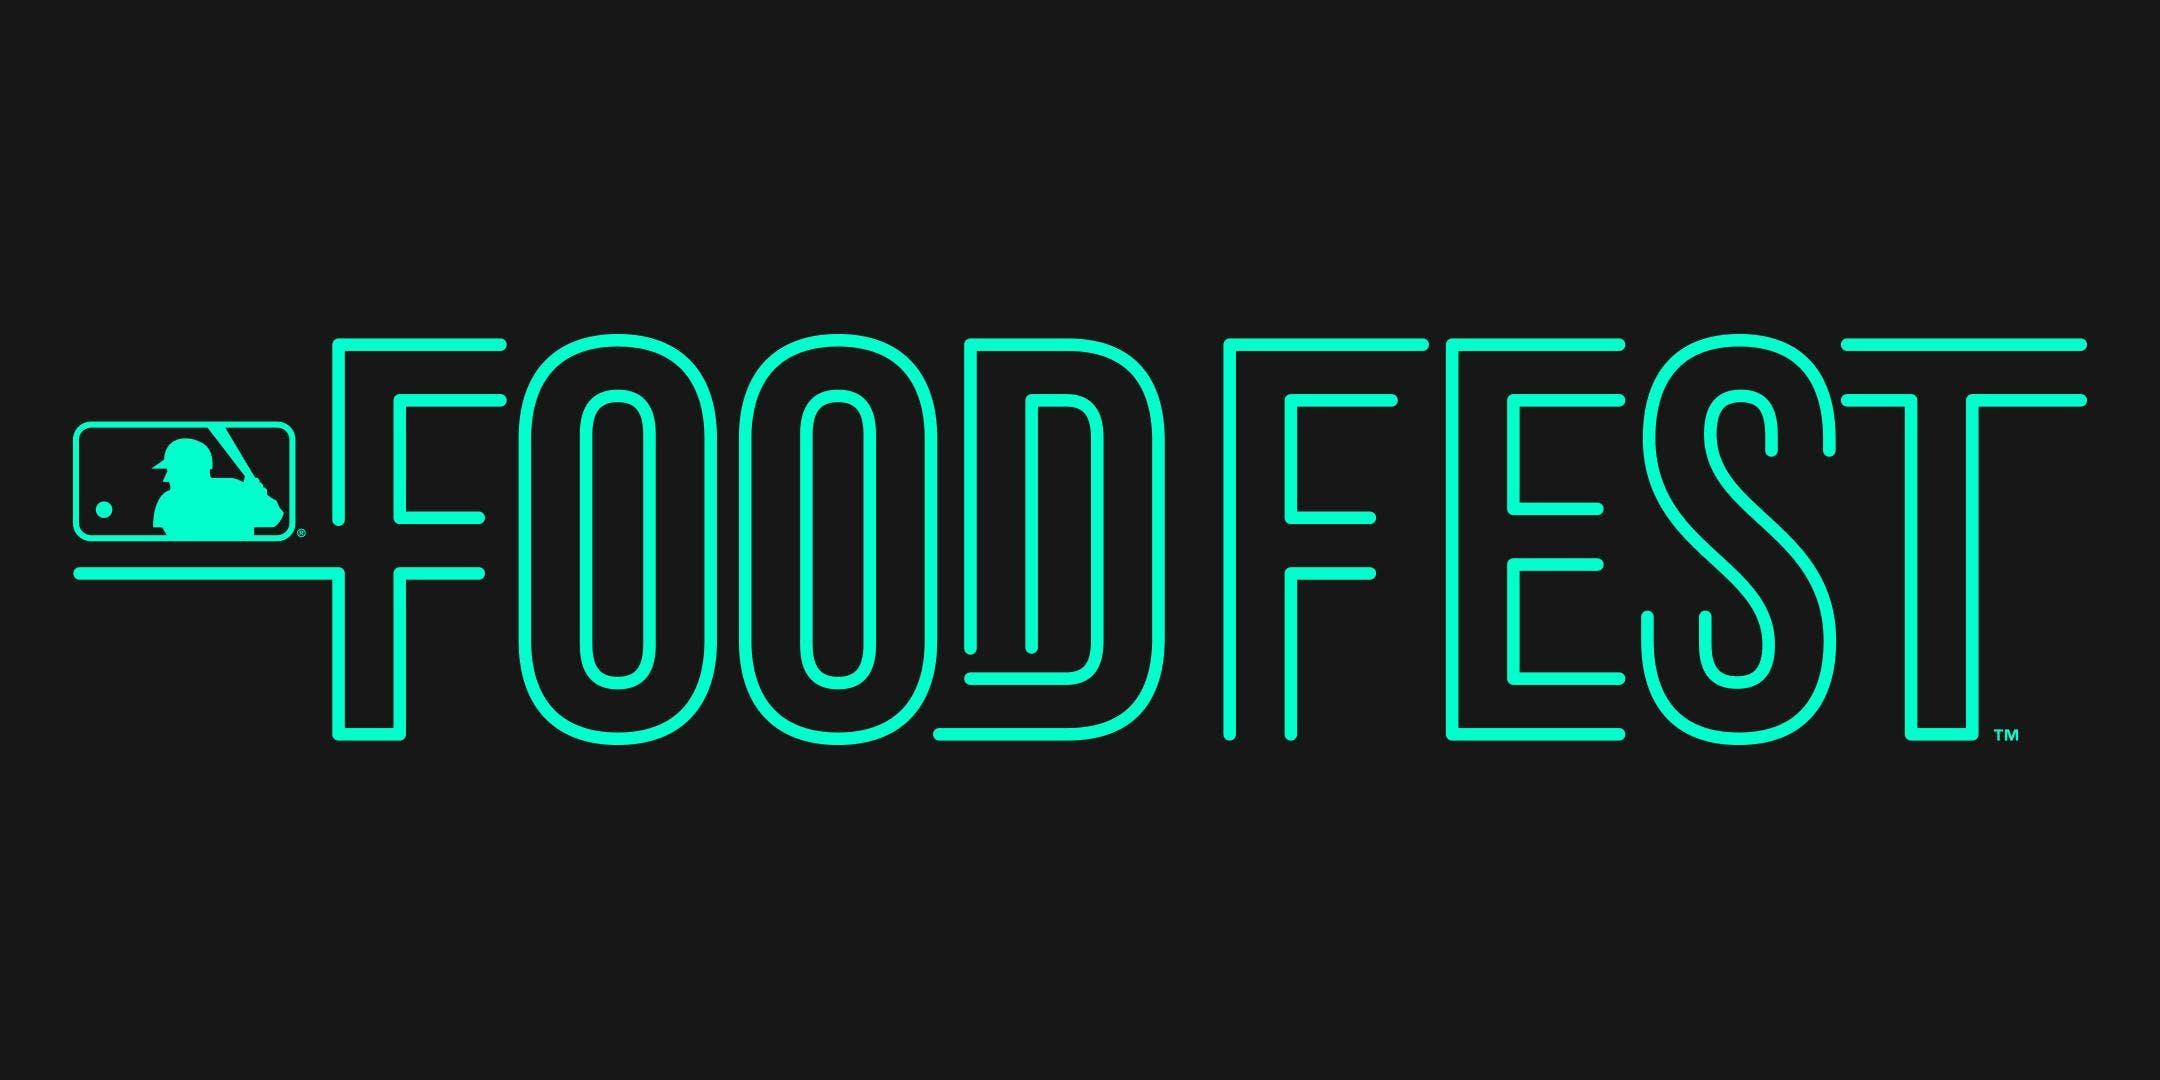 MLB FoodFest in London